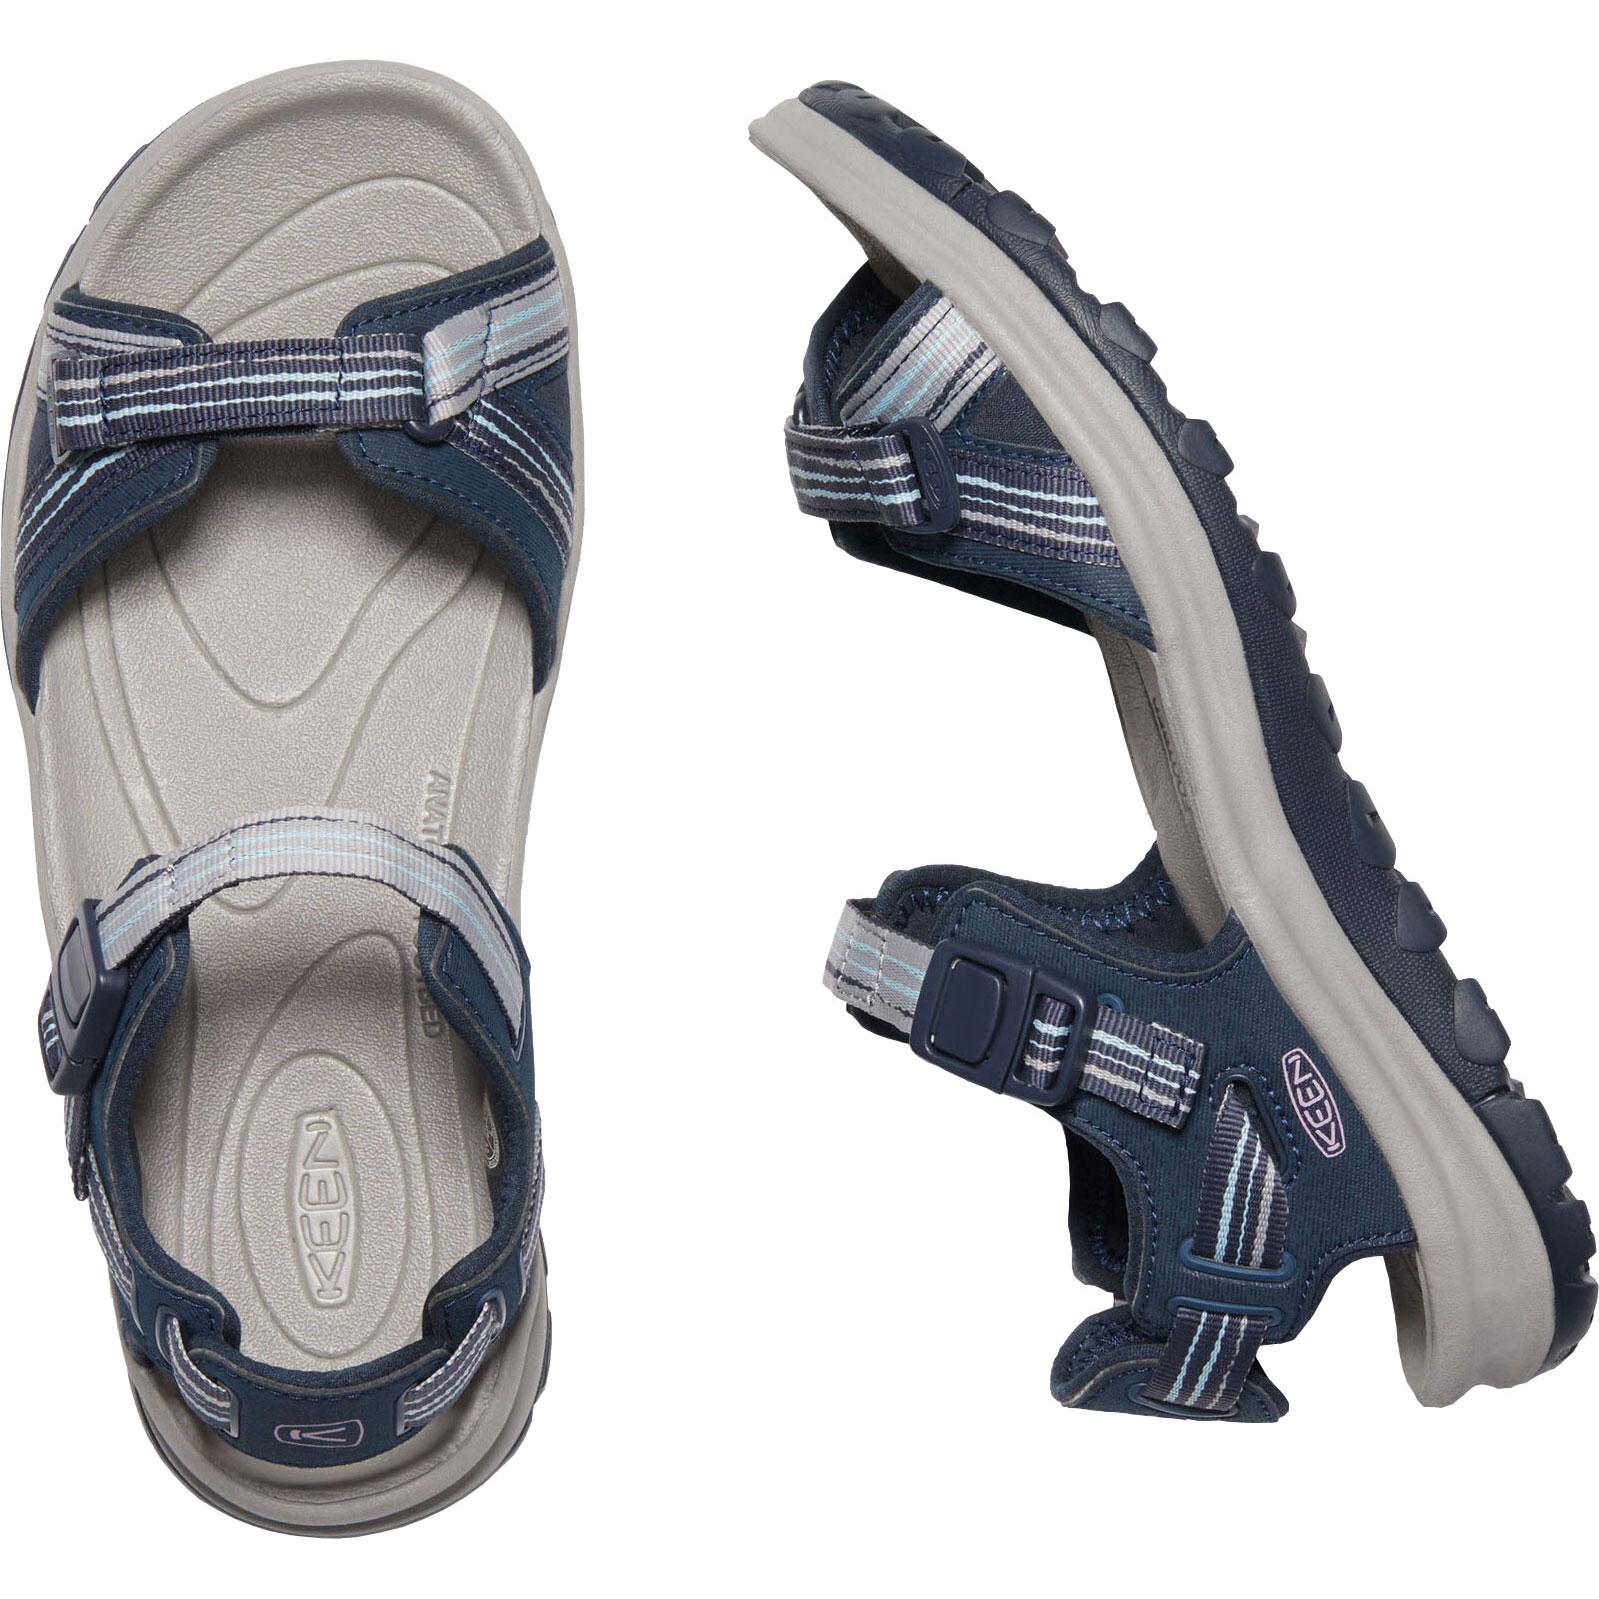 Bild von KEEN Terradora II Open Toe Damen-Sandale - Navy / Light Blue